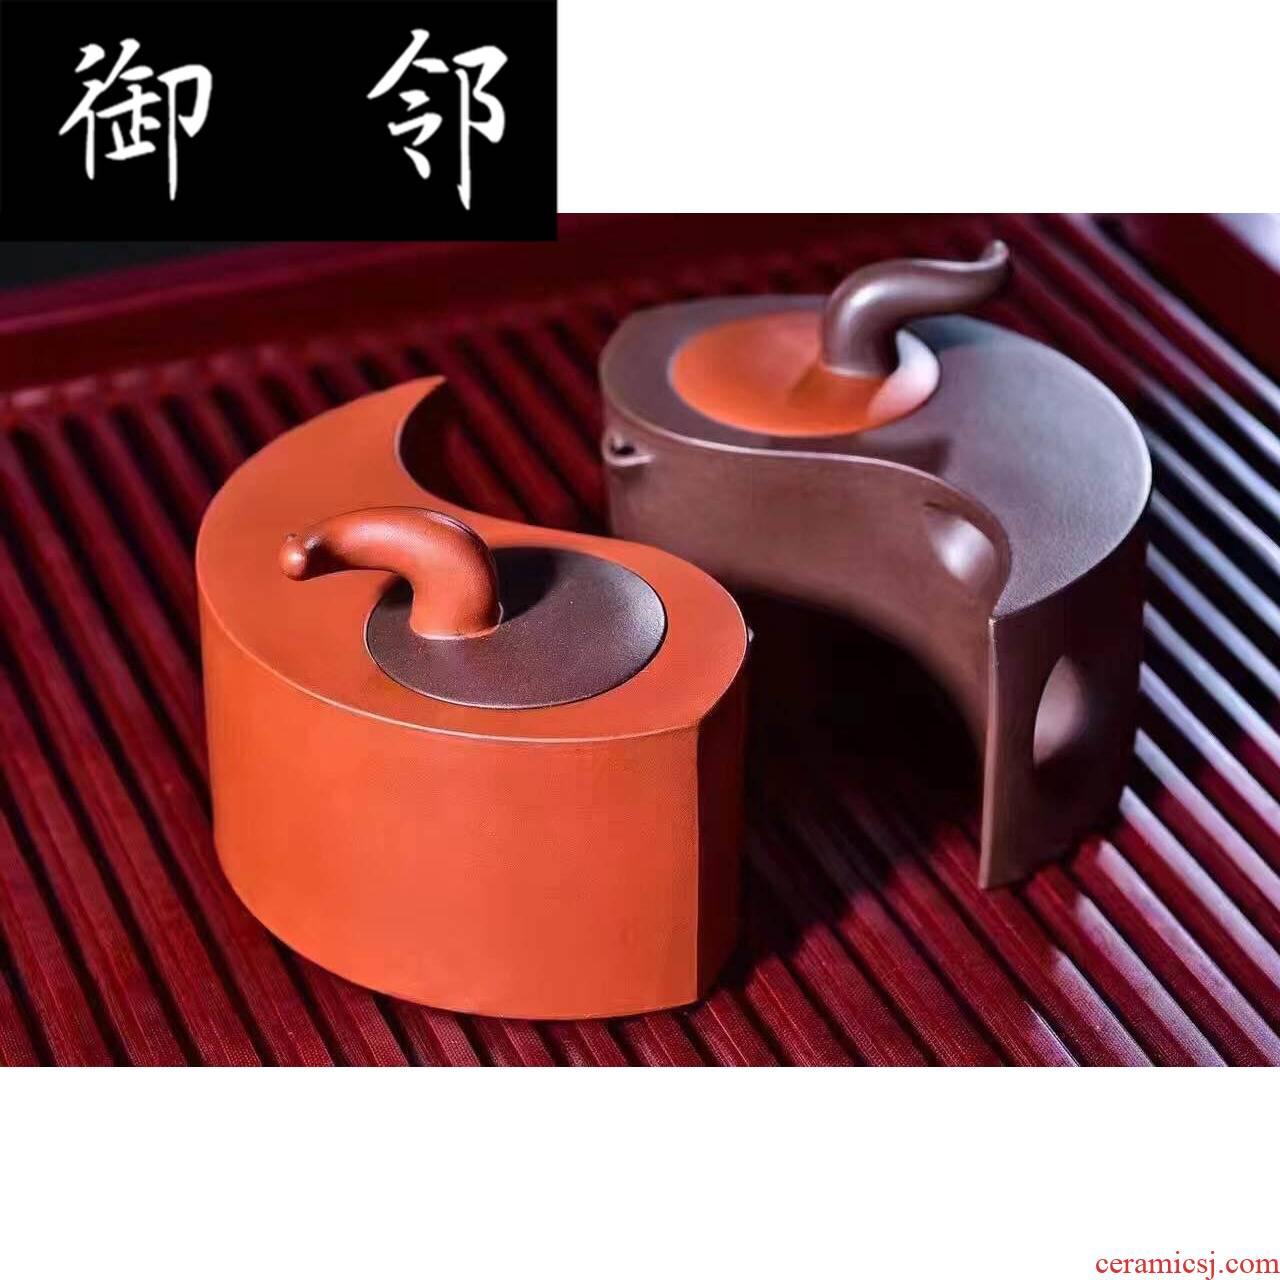 Ys, Yin and Yang tai chi bagua pot of run of mine ore the qing cement and purple clay Lv Yachen manual it 250 cc